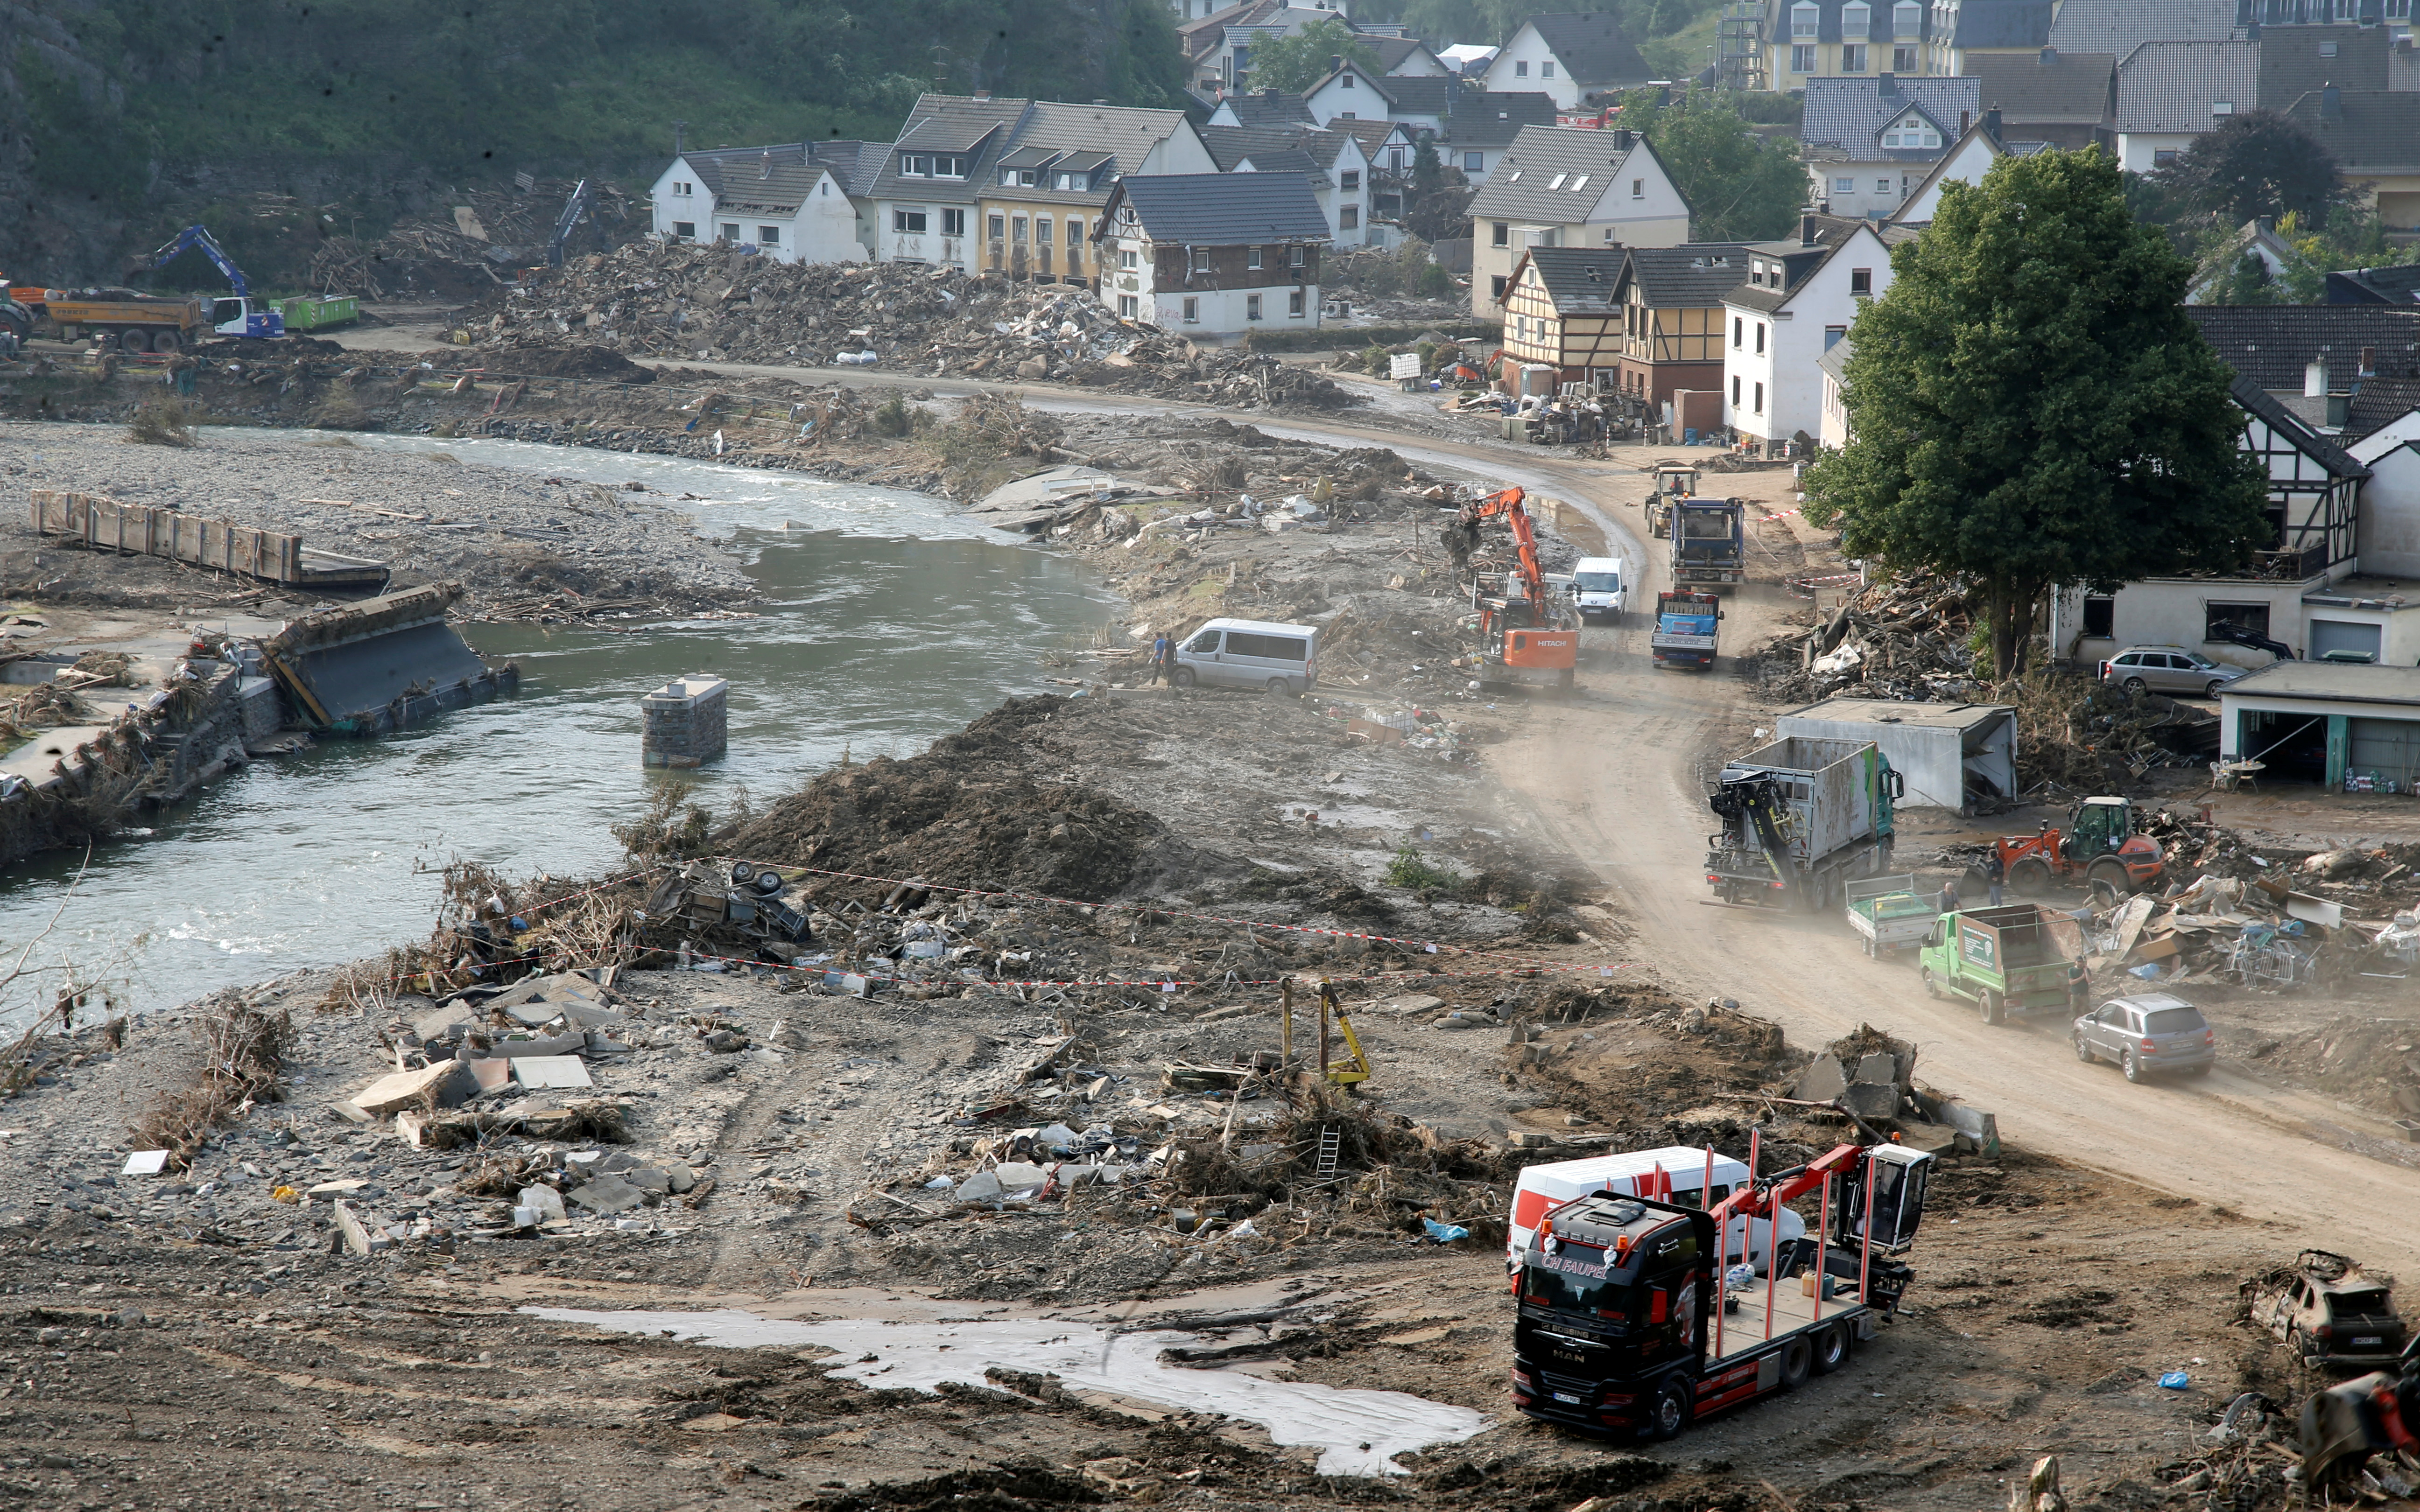 General view following heavy rainfalls in Altenburg, Germany, July 23, 2021. REUTERS/Leon Kuegeler